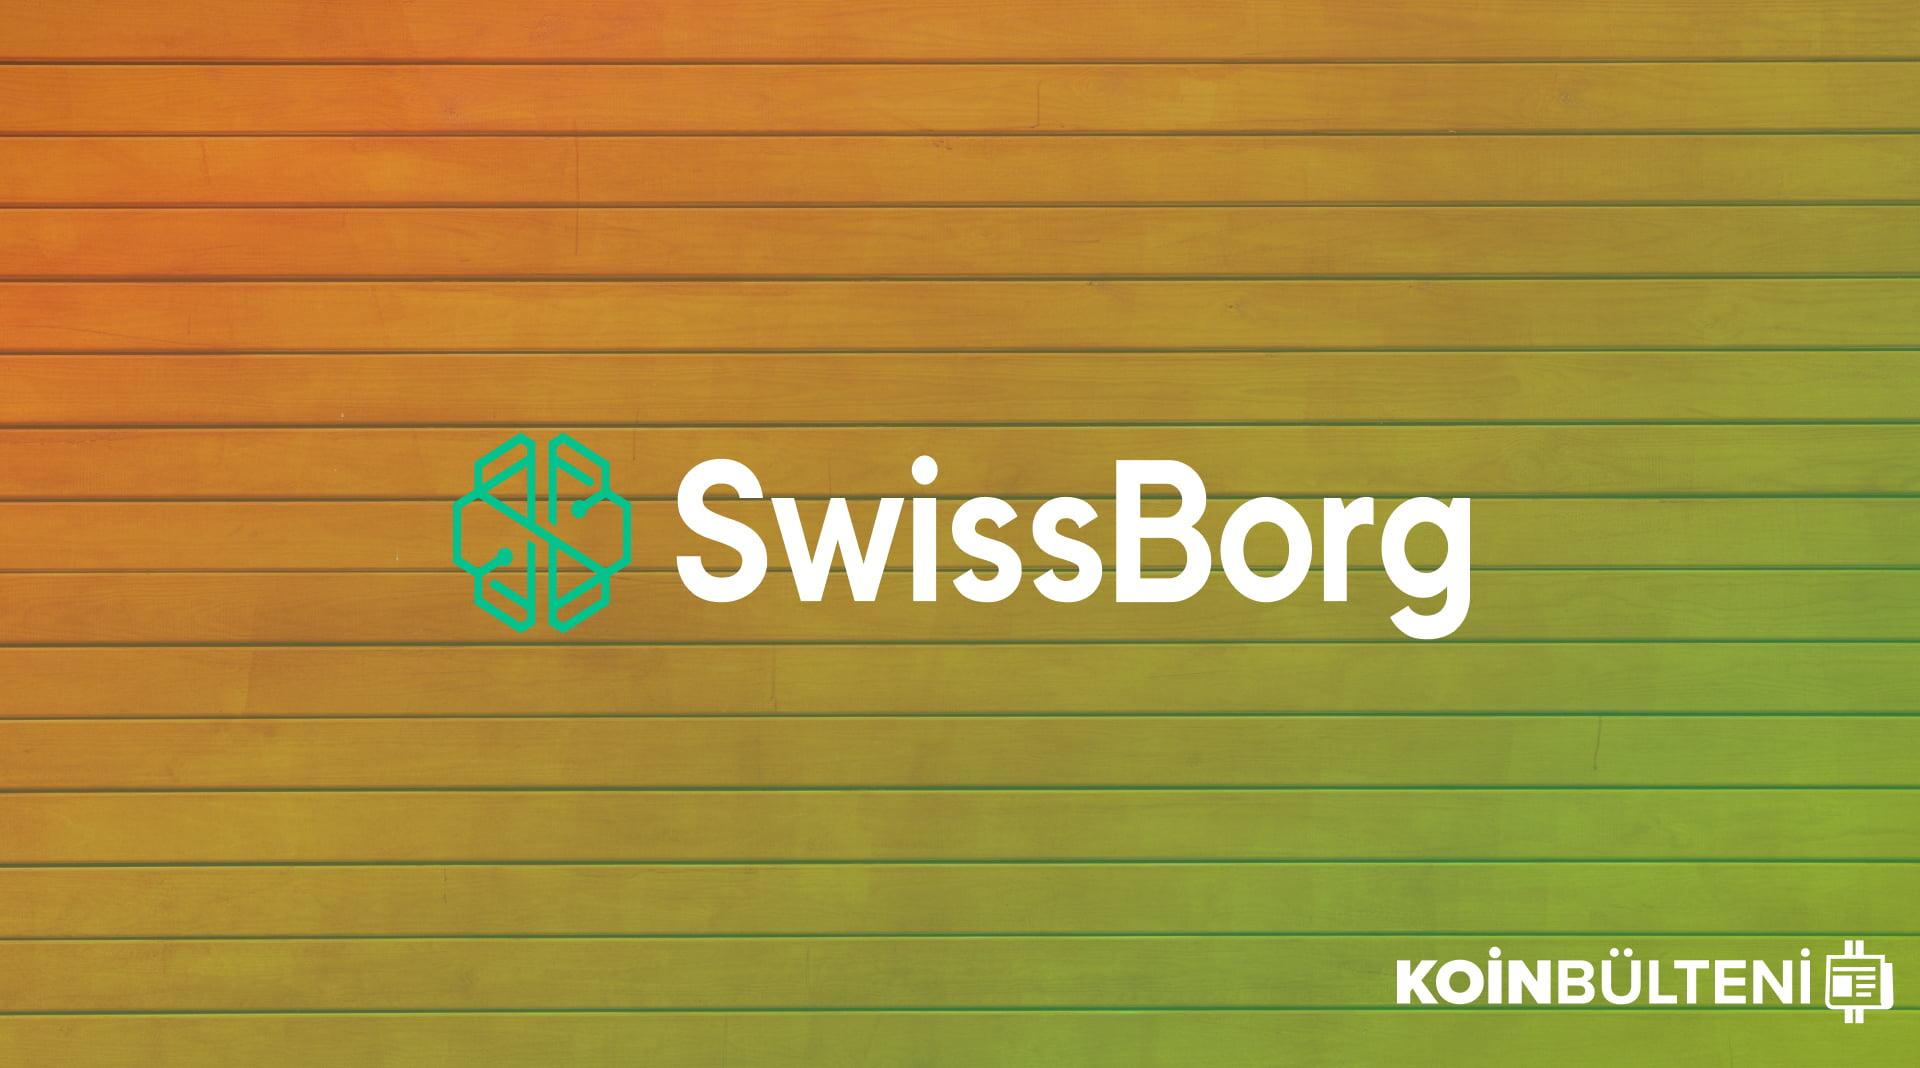 swissborg-chsb